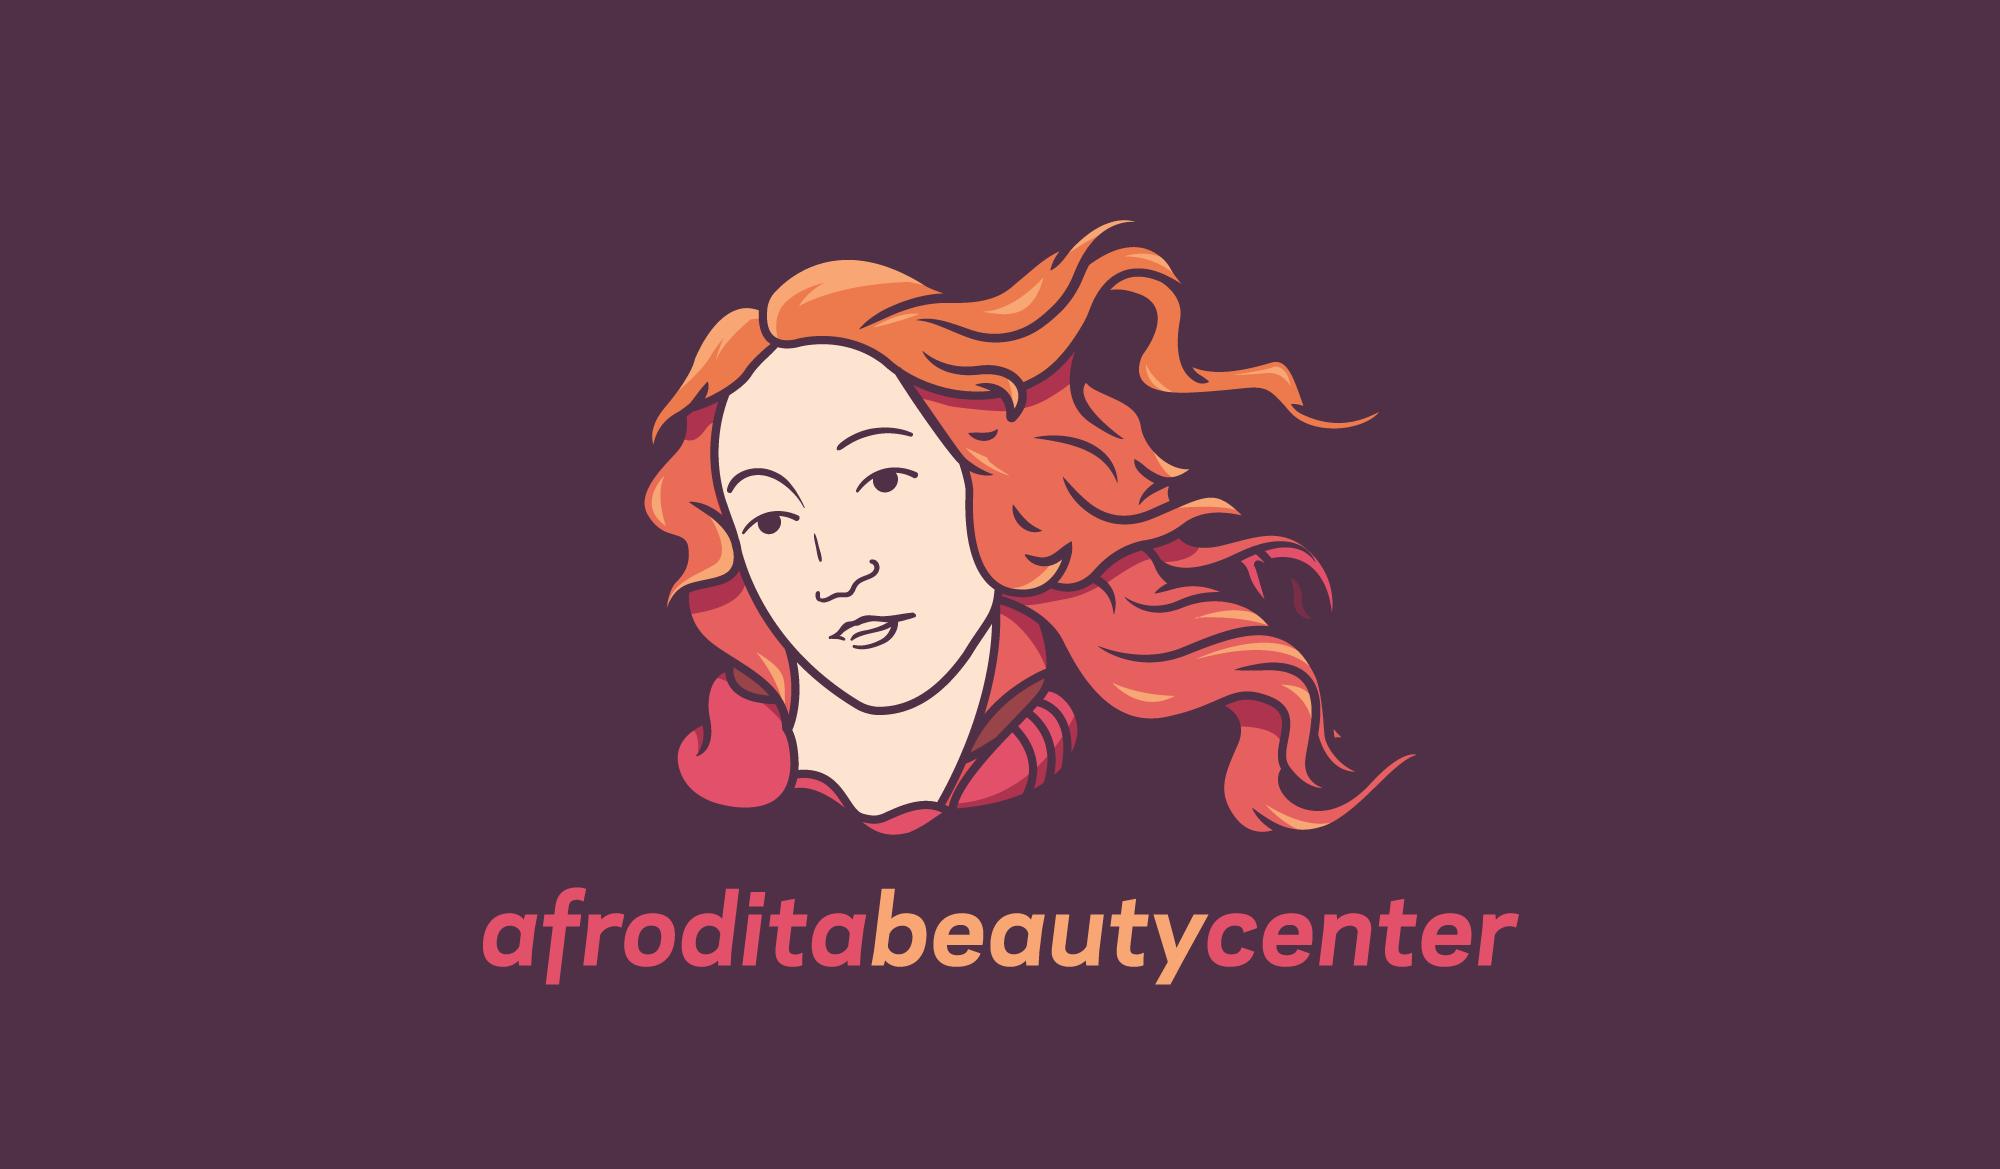 Afroditabeauty